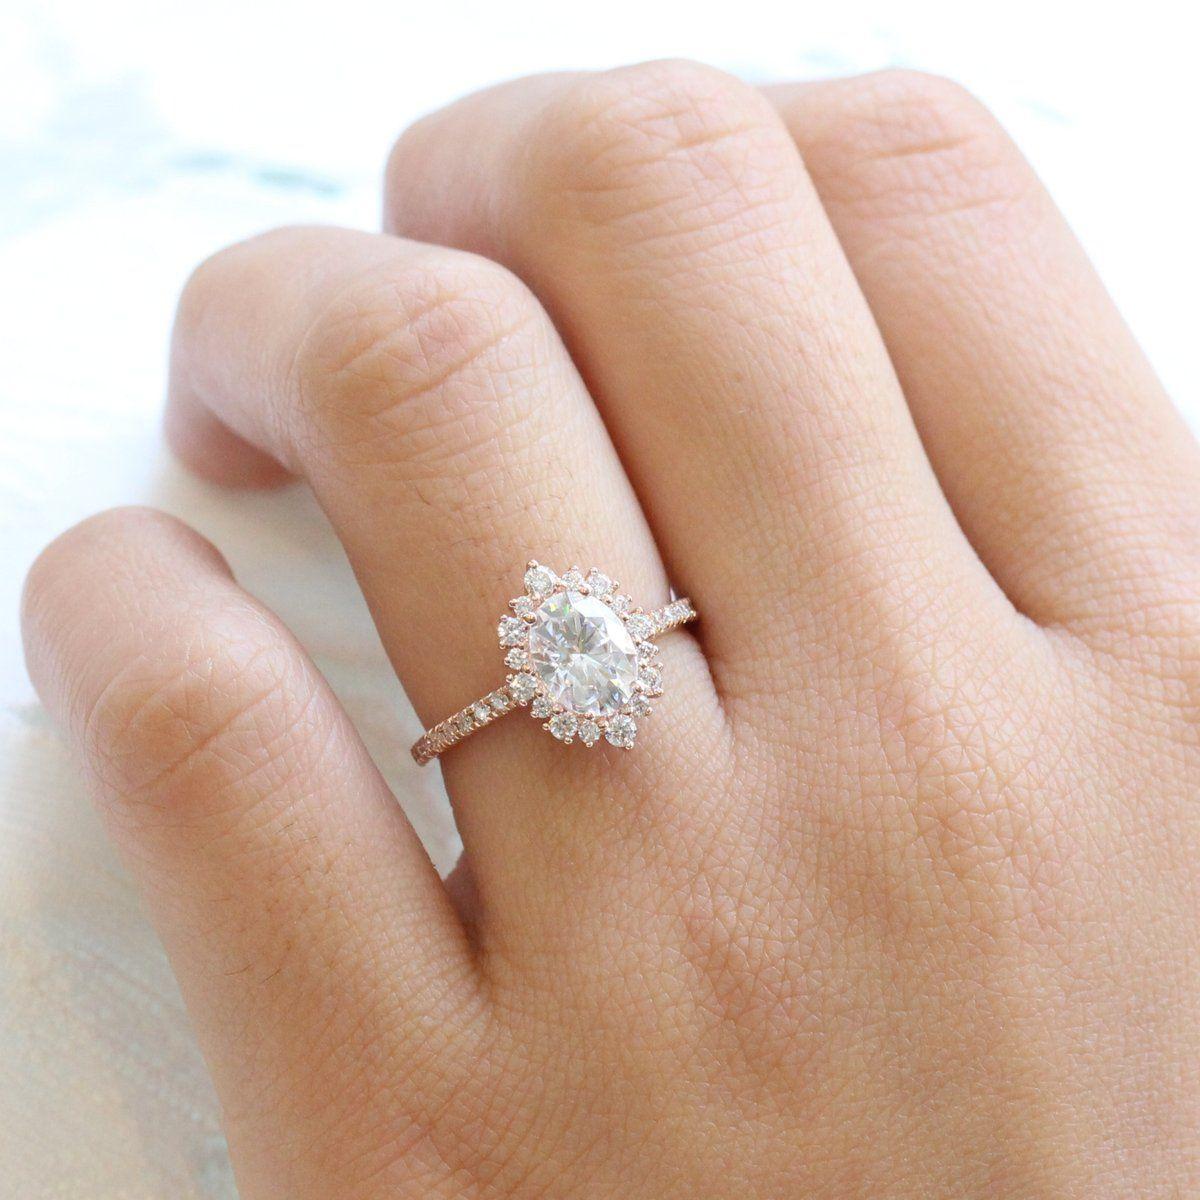 Tiara Halo Ring In Pave Band W Oval Moissanite And Diamond Halo Diamond Ring Set Matching Wedding Rings Diamond Alternative Engagement Ring